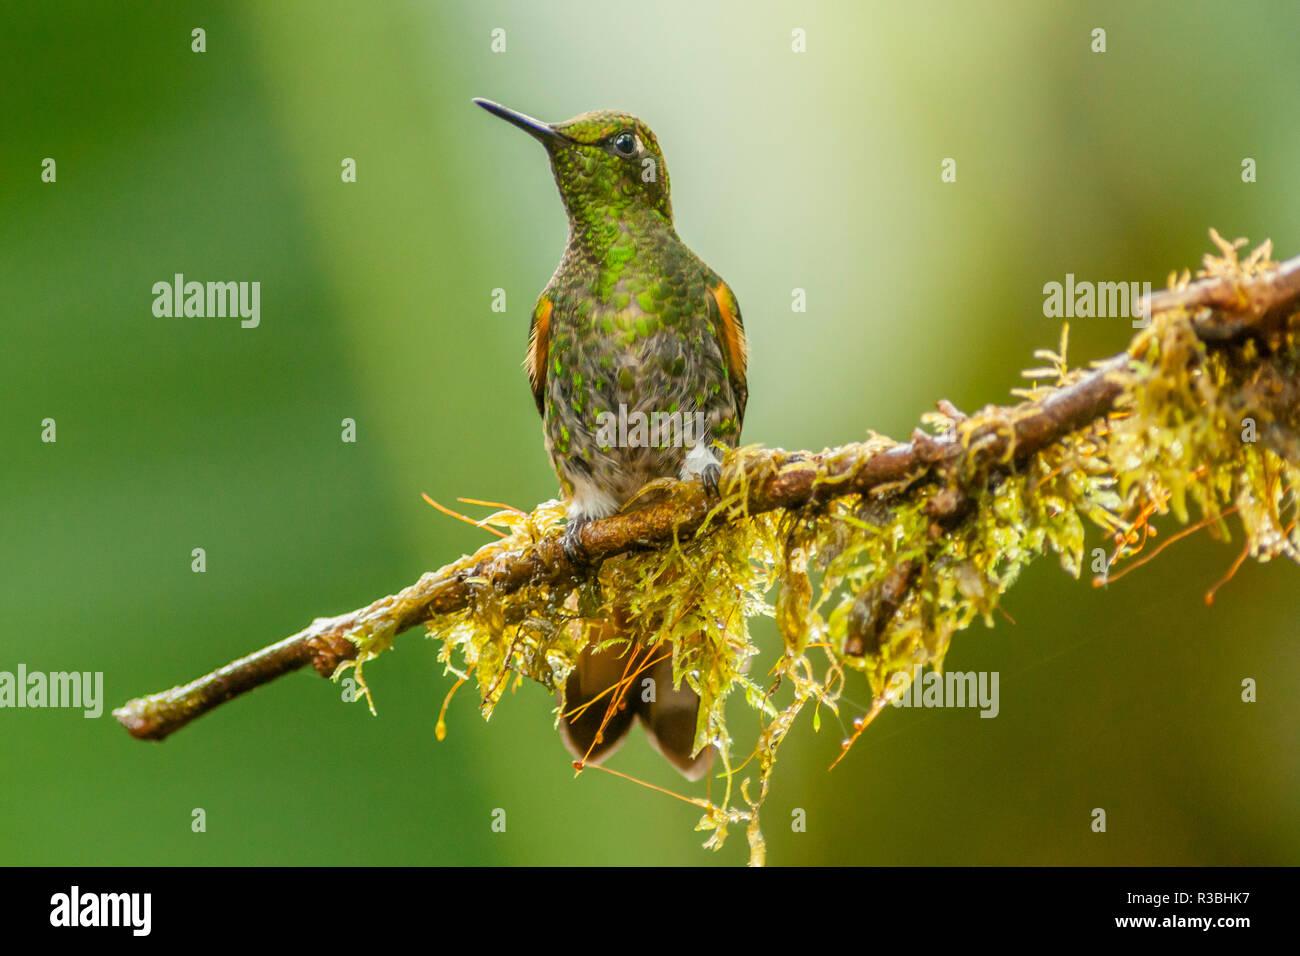 Ecuador, Tandayapa Bird Lodge. Buff-tailed coronet on limb. - Stock Image